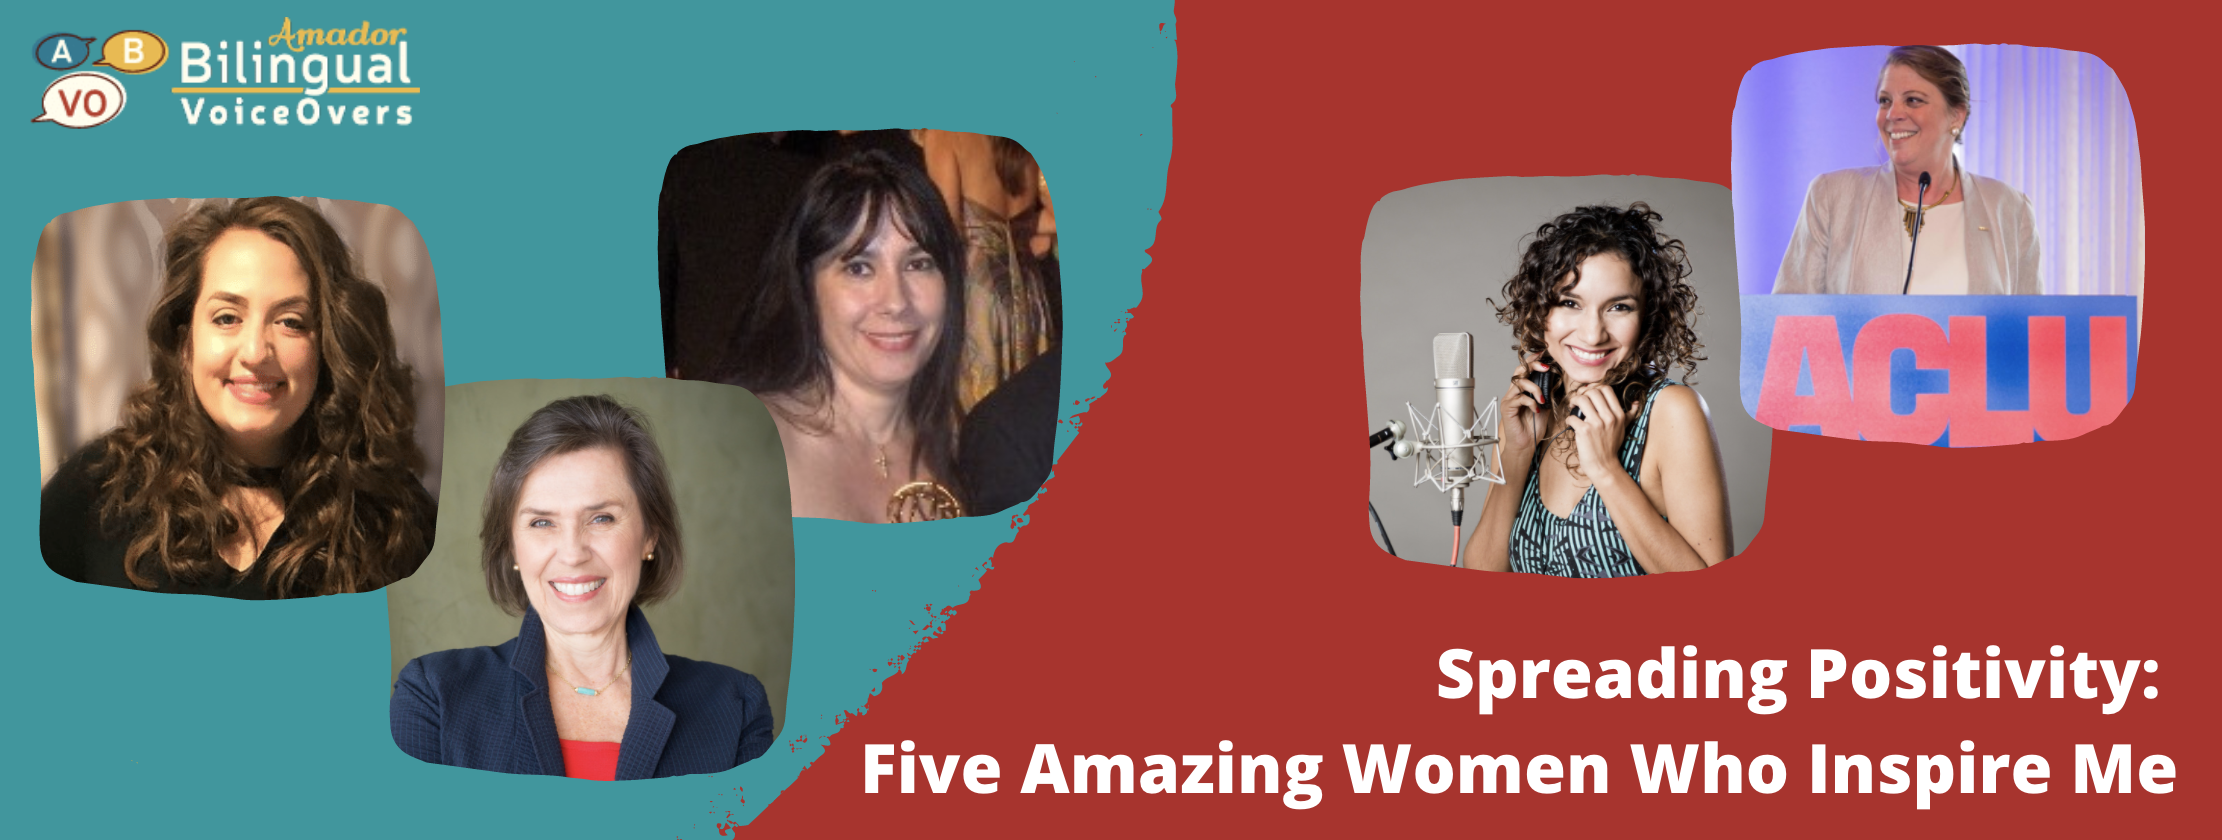 Amador Bilingual Voiceovers Women That Inspire Me